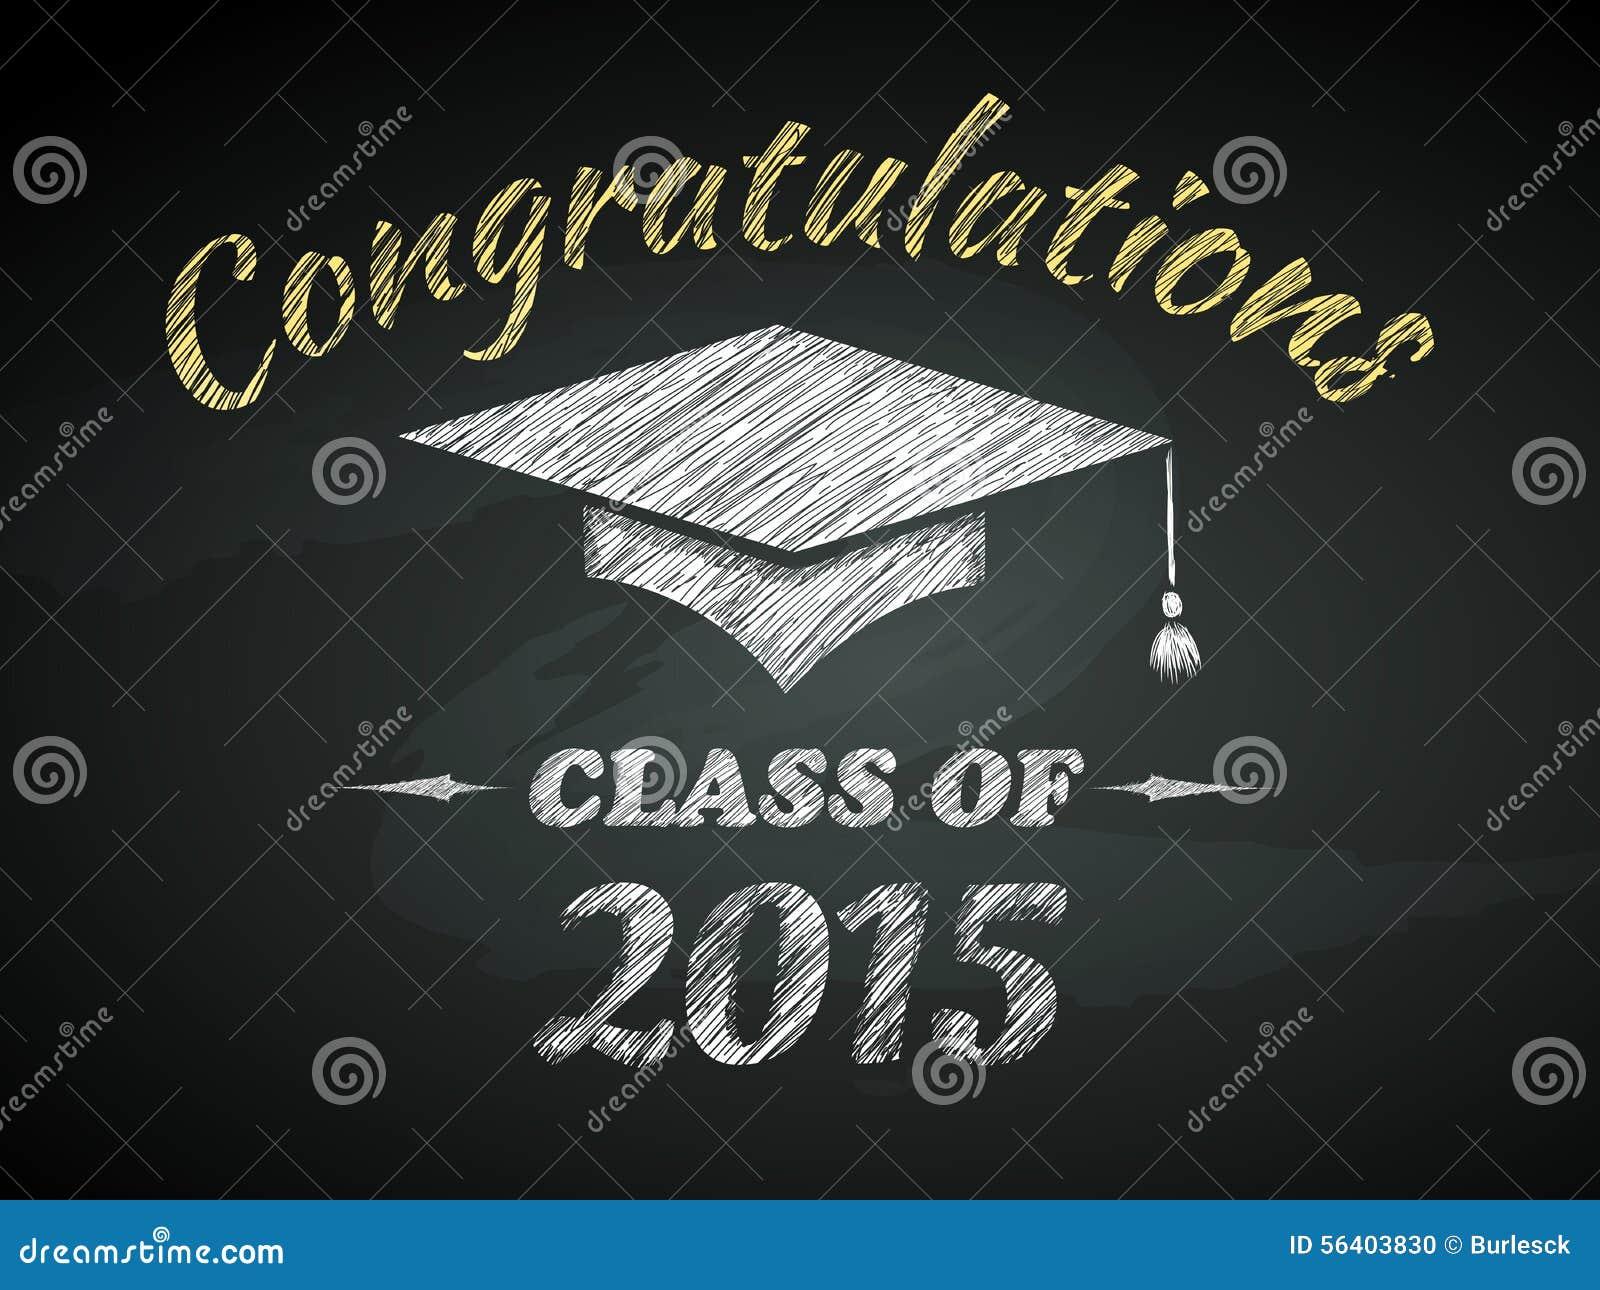 Class Of Graduation Poster Stock Vector Image 56403830